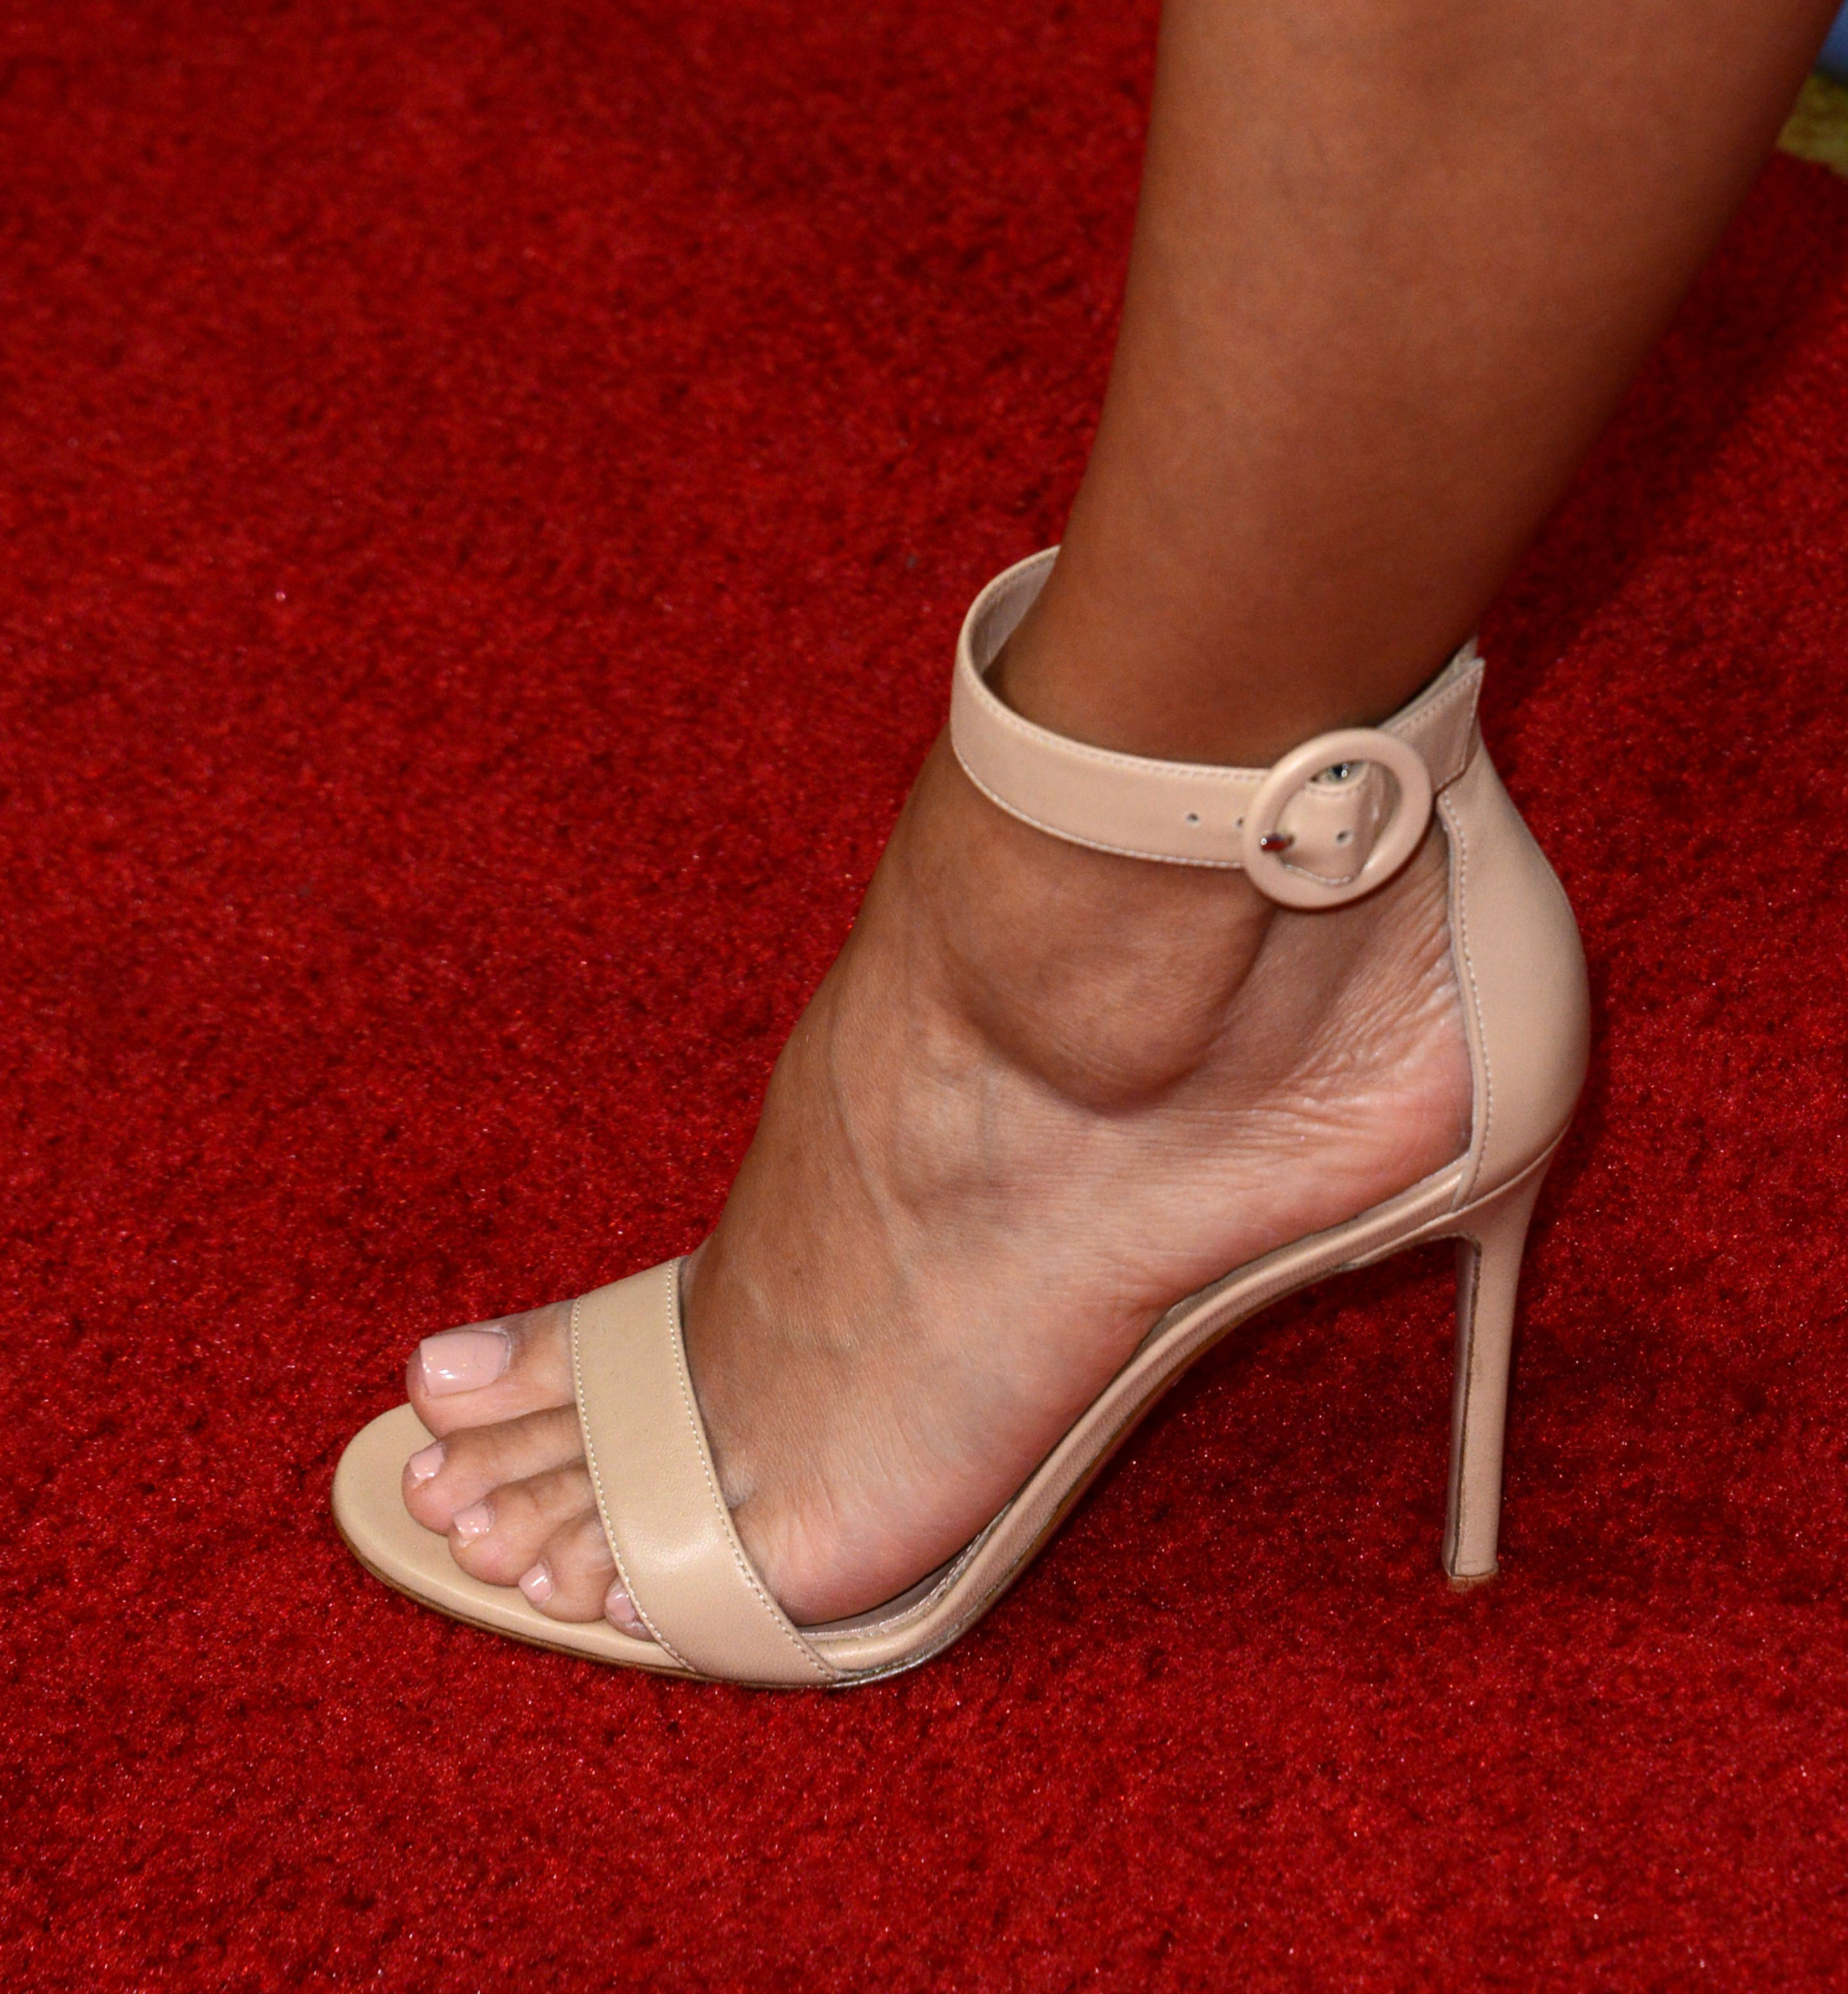 Eva Longoria's Feet